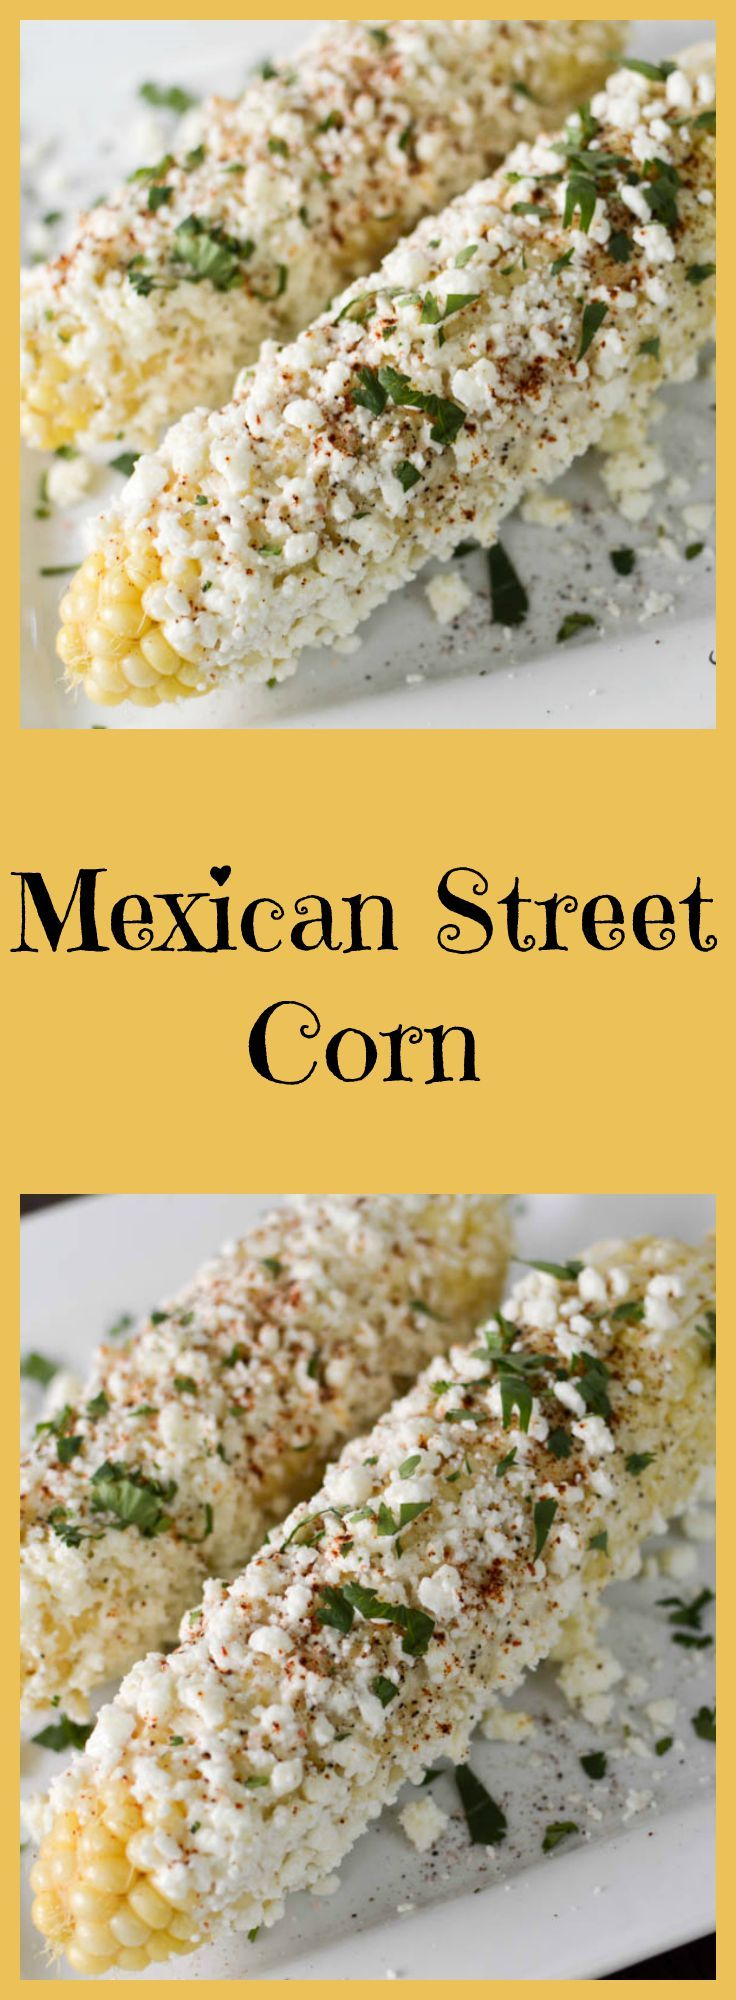 Tasty Mexican Street Corn Recipe